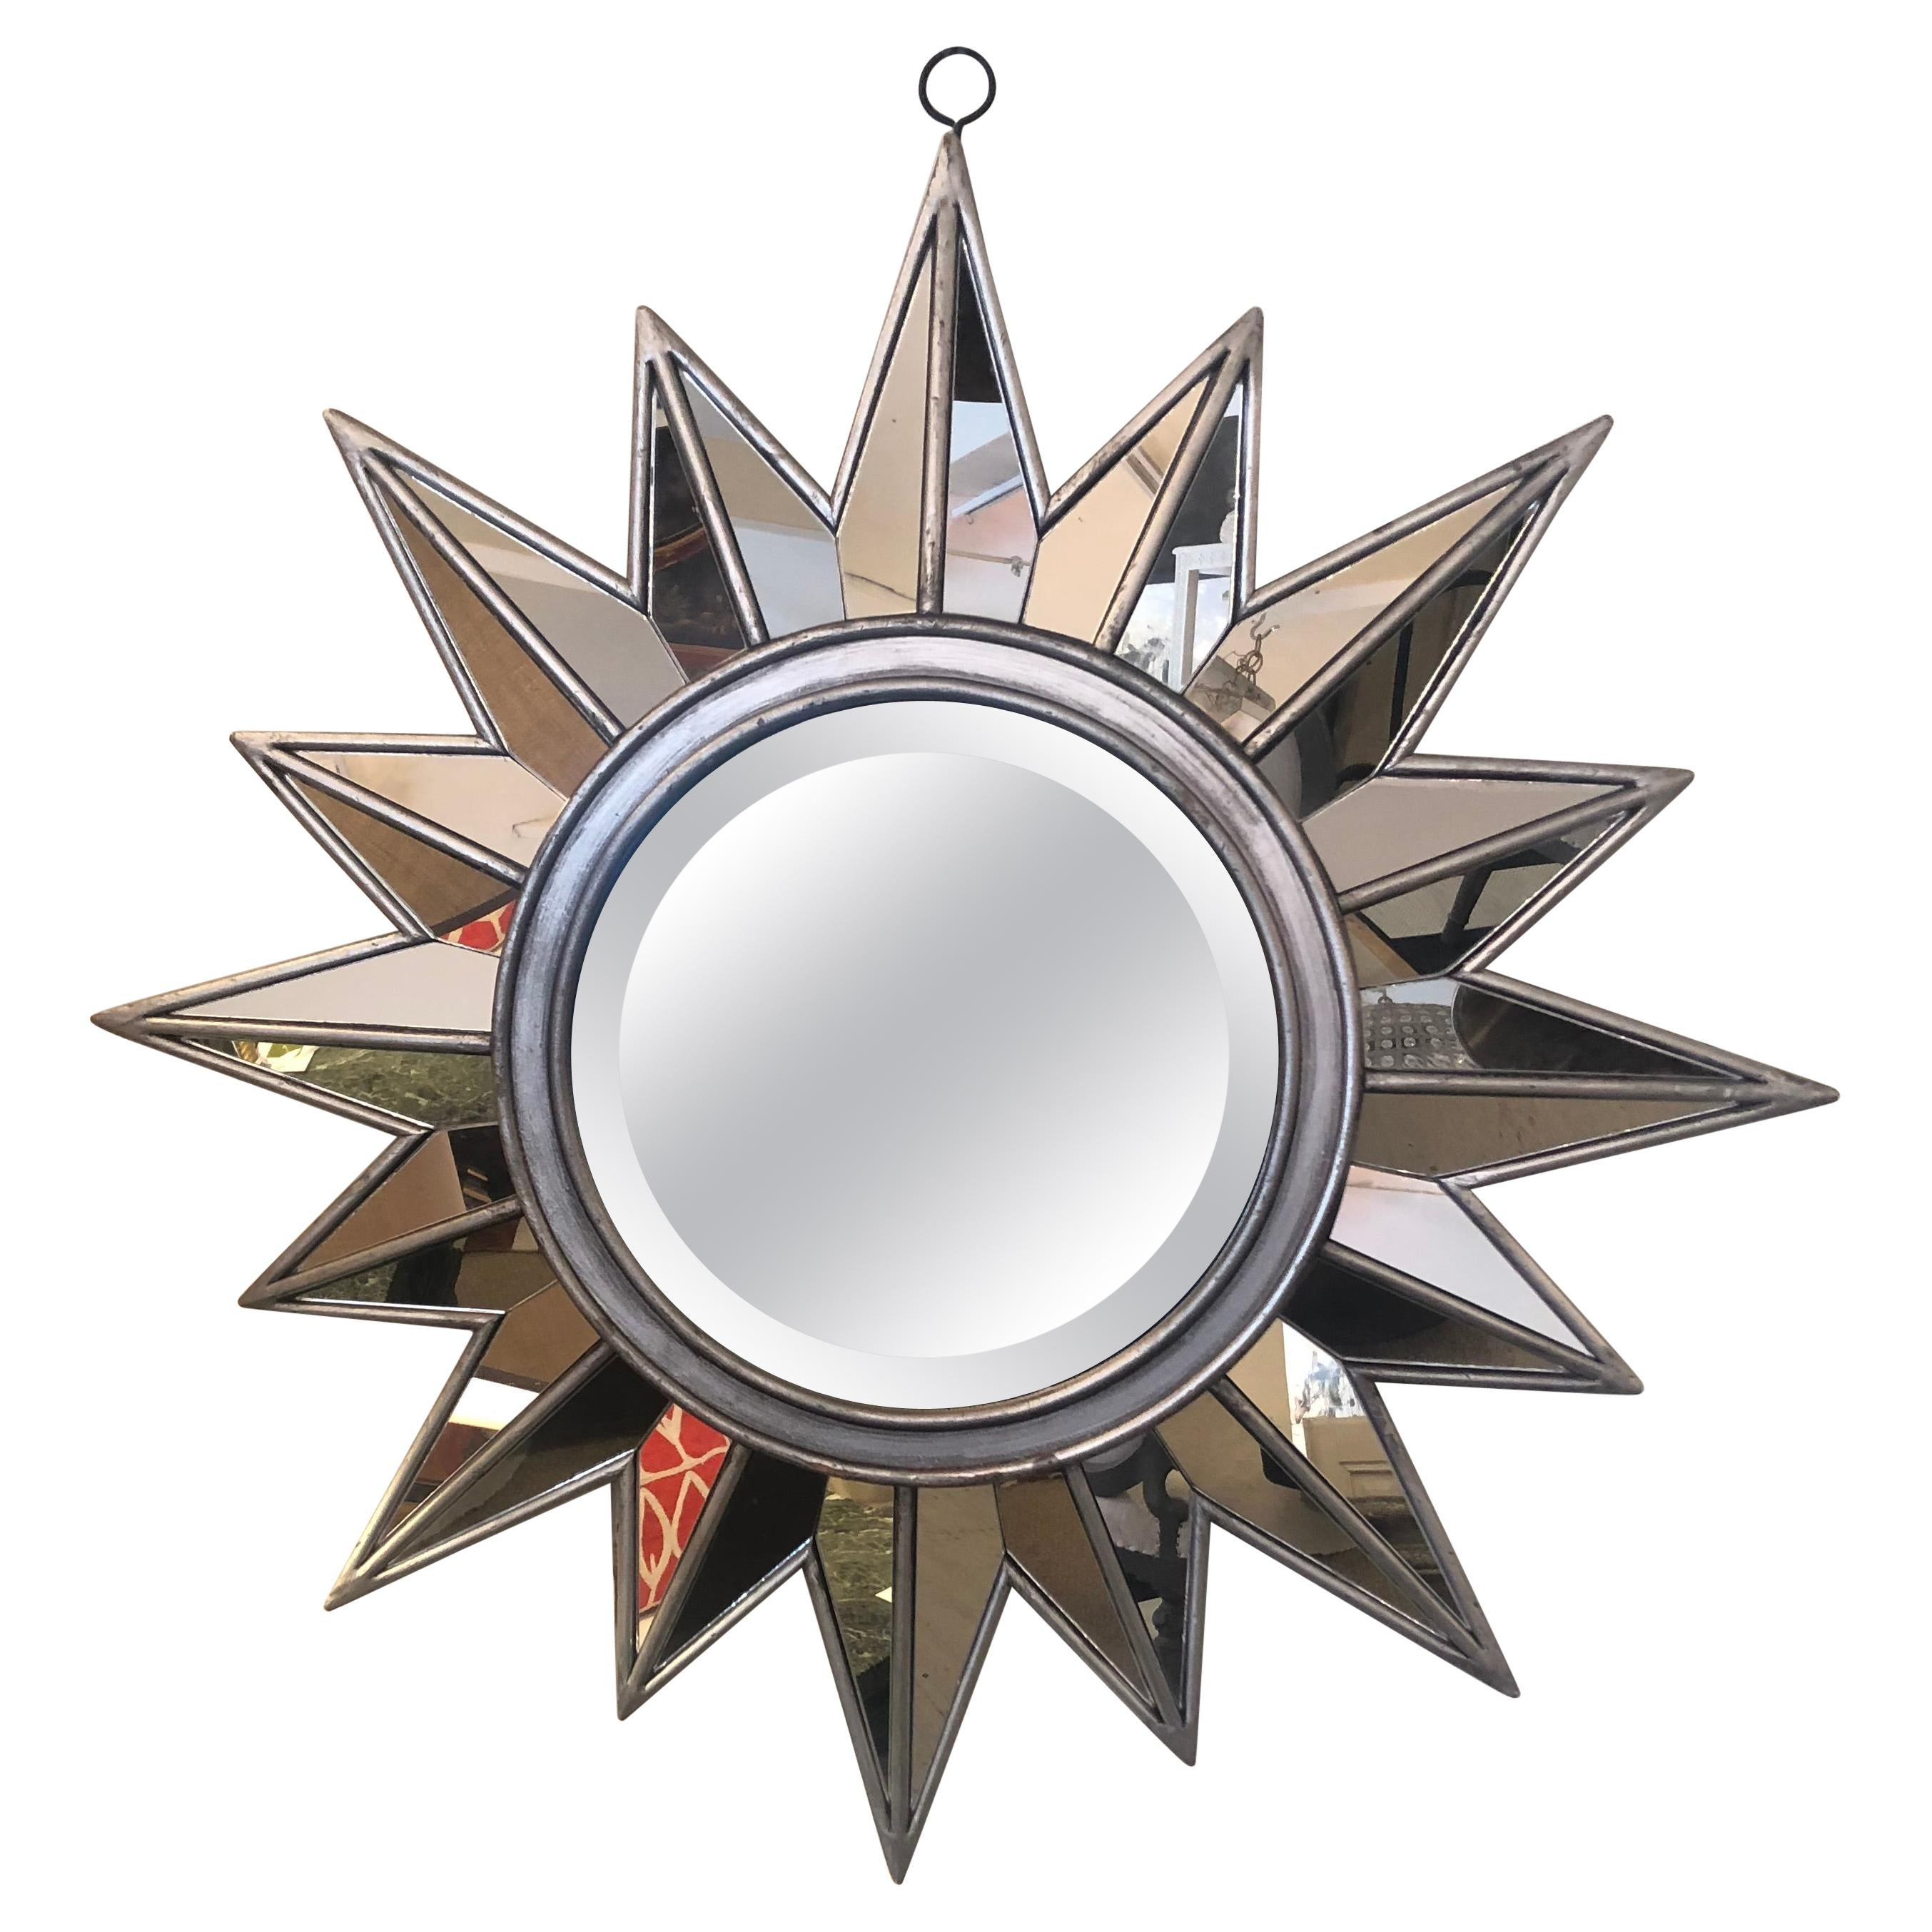 Radiant Sunburst Starburst Bevelled Mirror